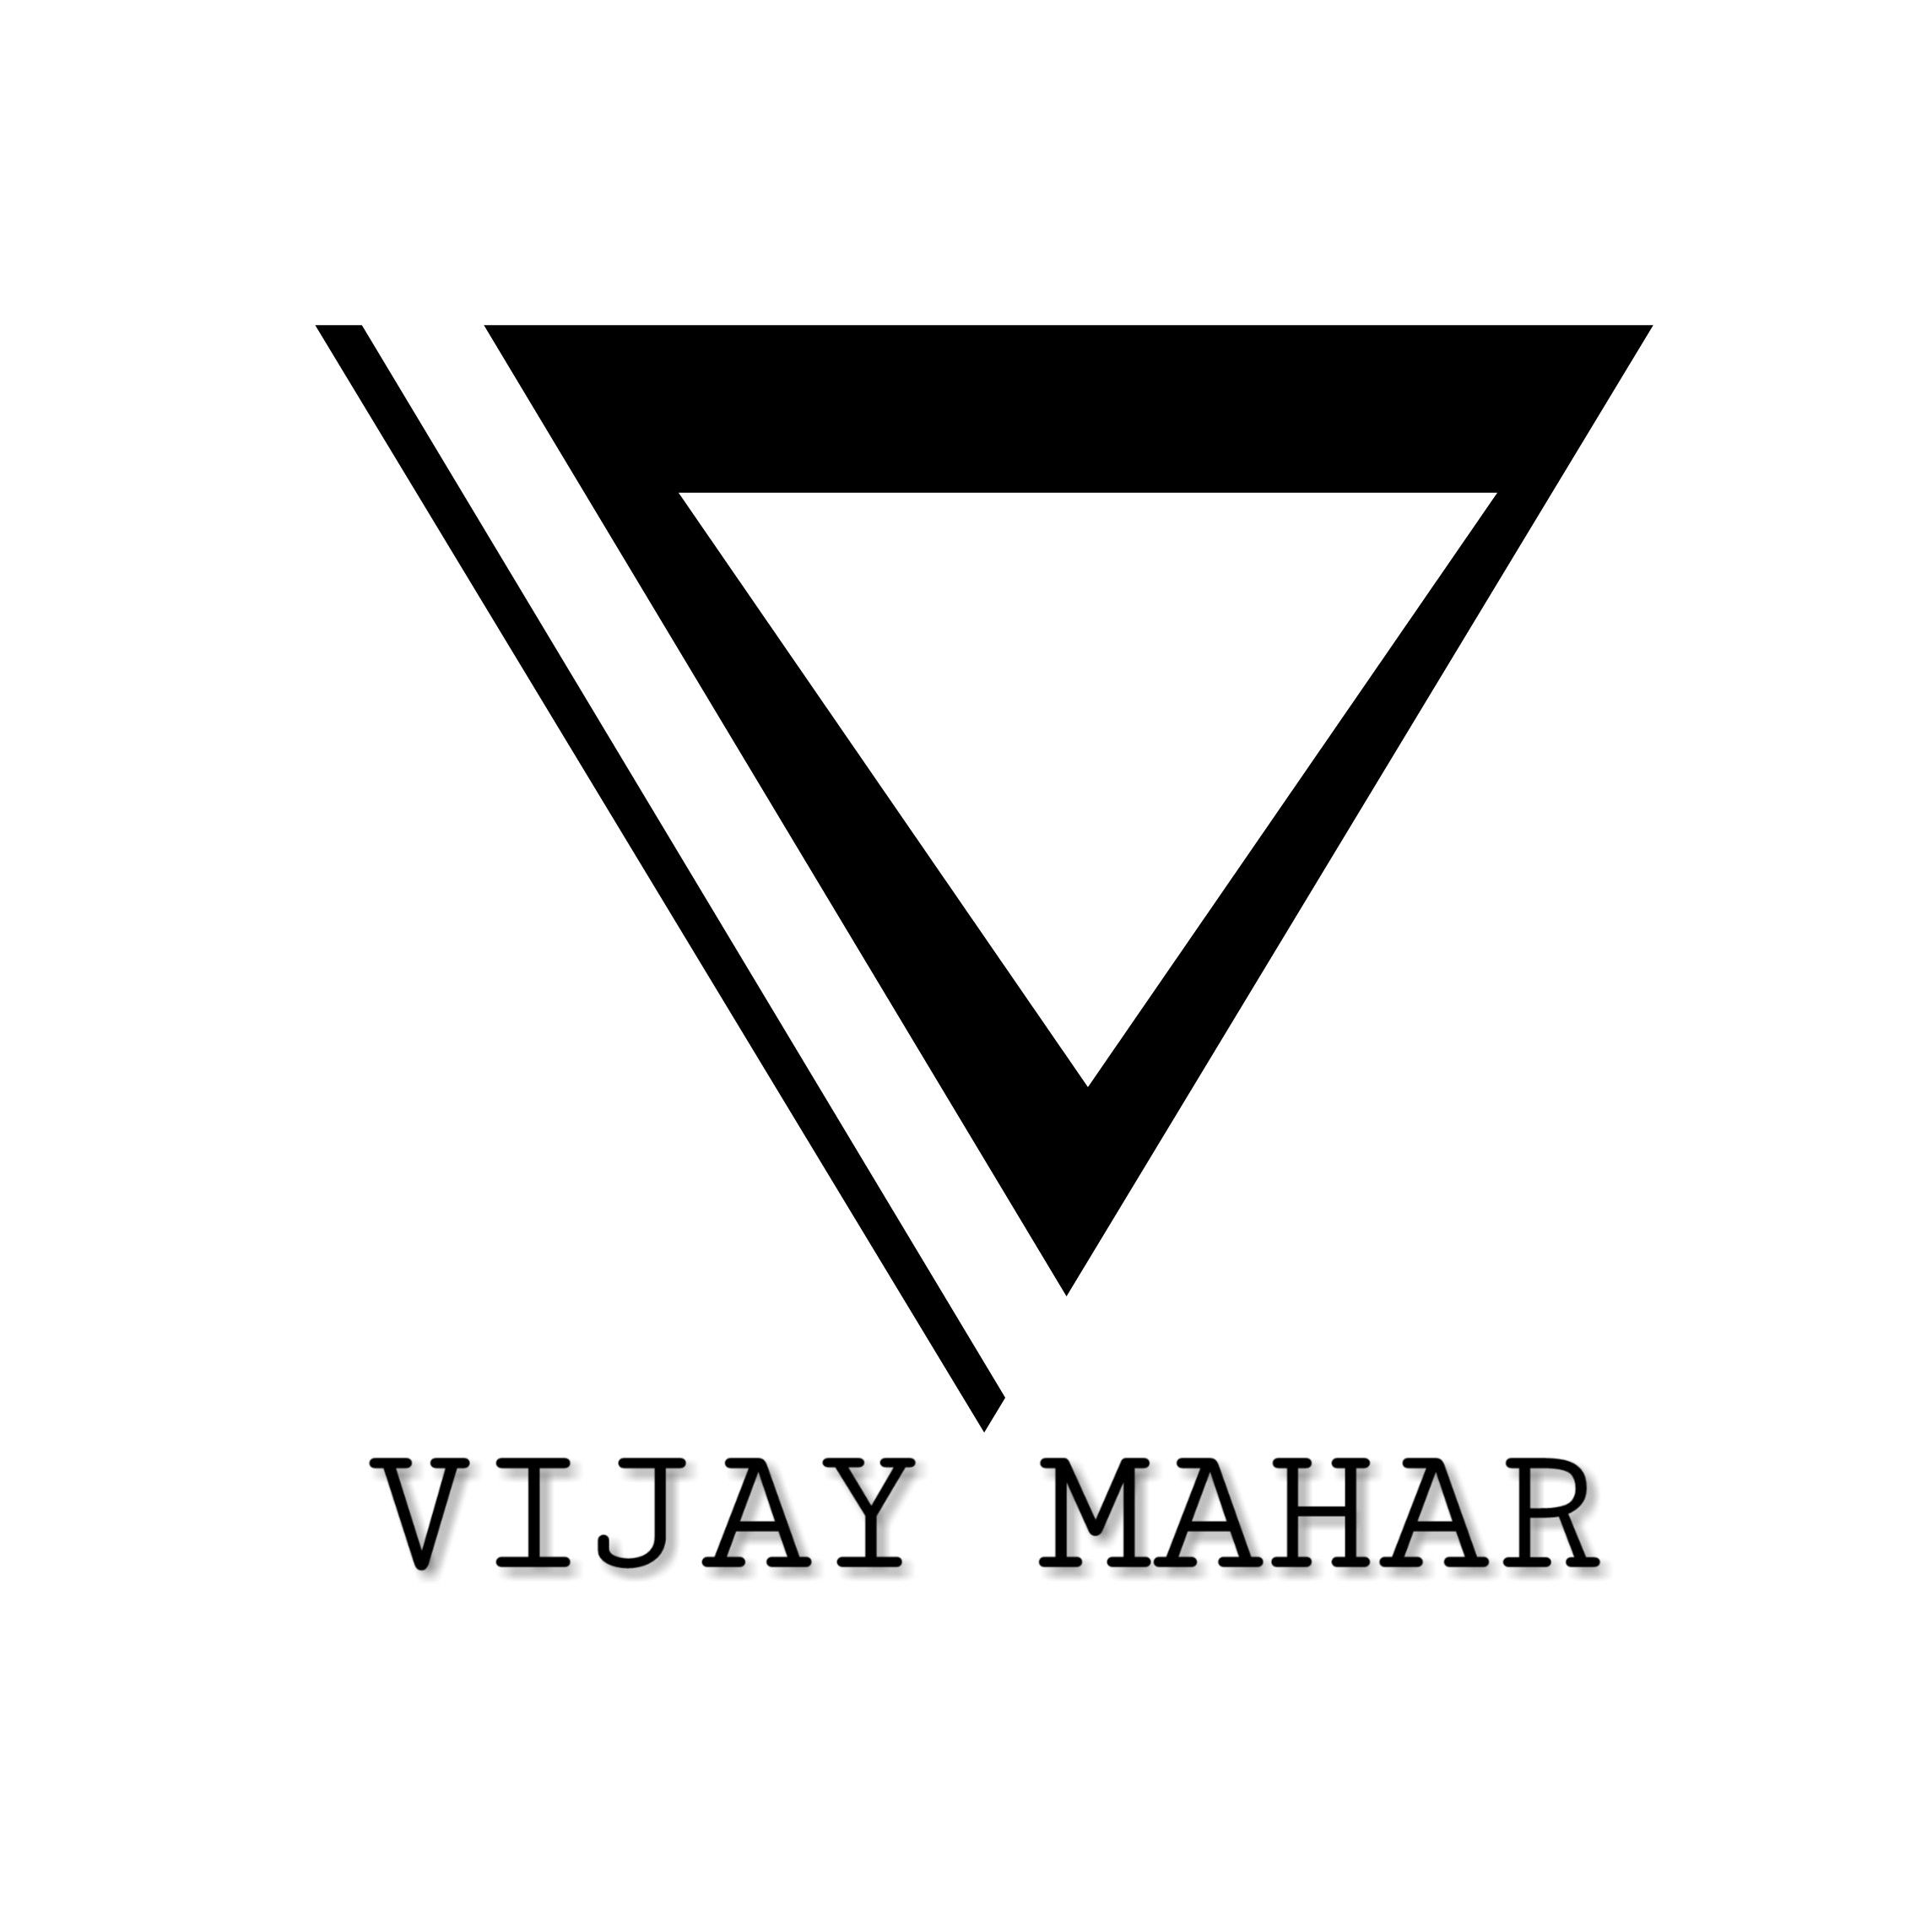 Vijay Mahar Logo Freetoedit Remixit In 2020 Photoshop Logo Photography Name Logo Background Images Wallpapers